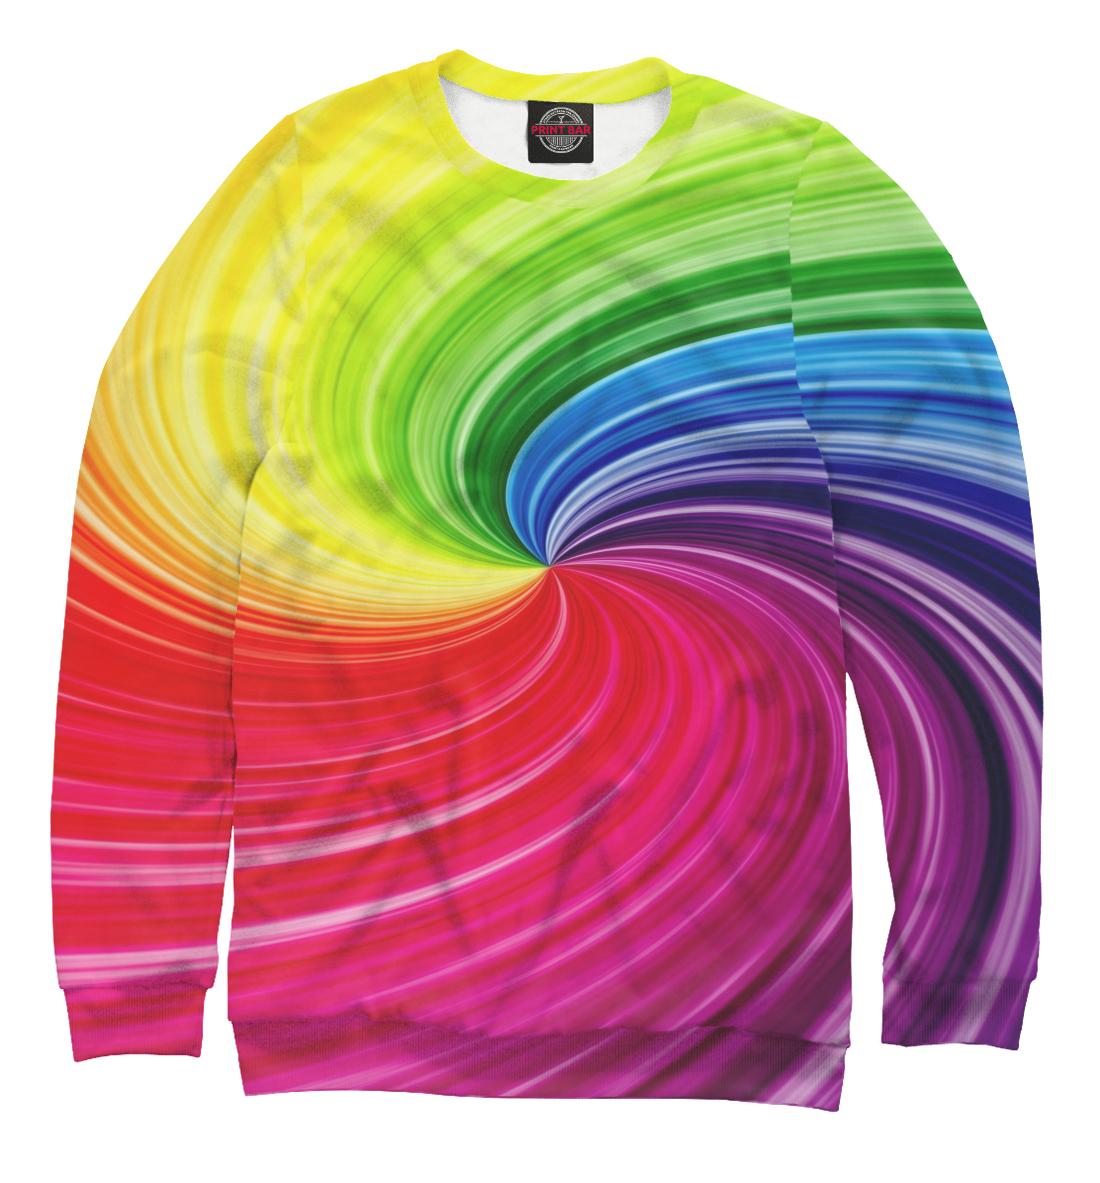 Купить Краска, Printbar, Свитшоты, ABS-224382-swi-2